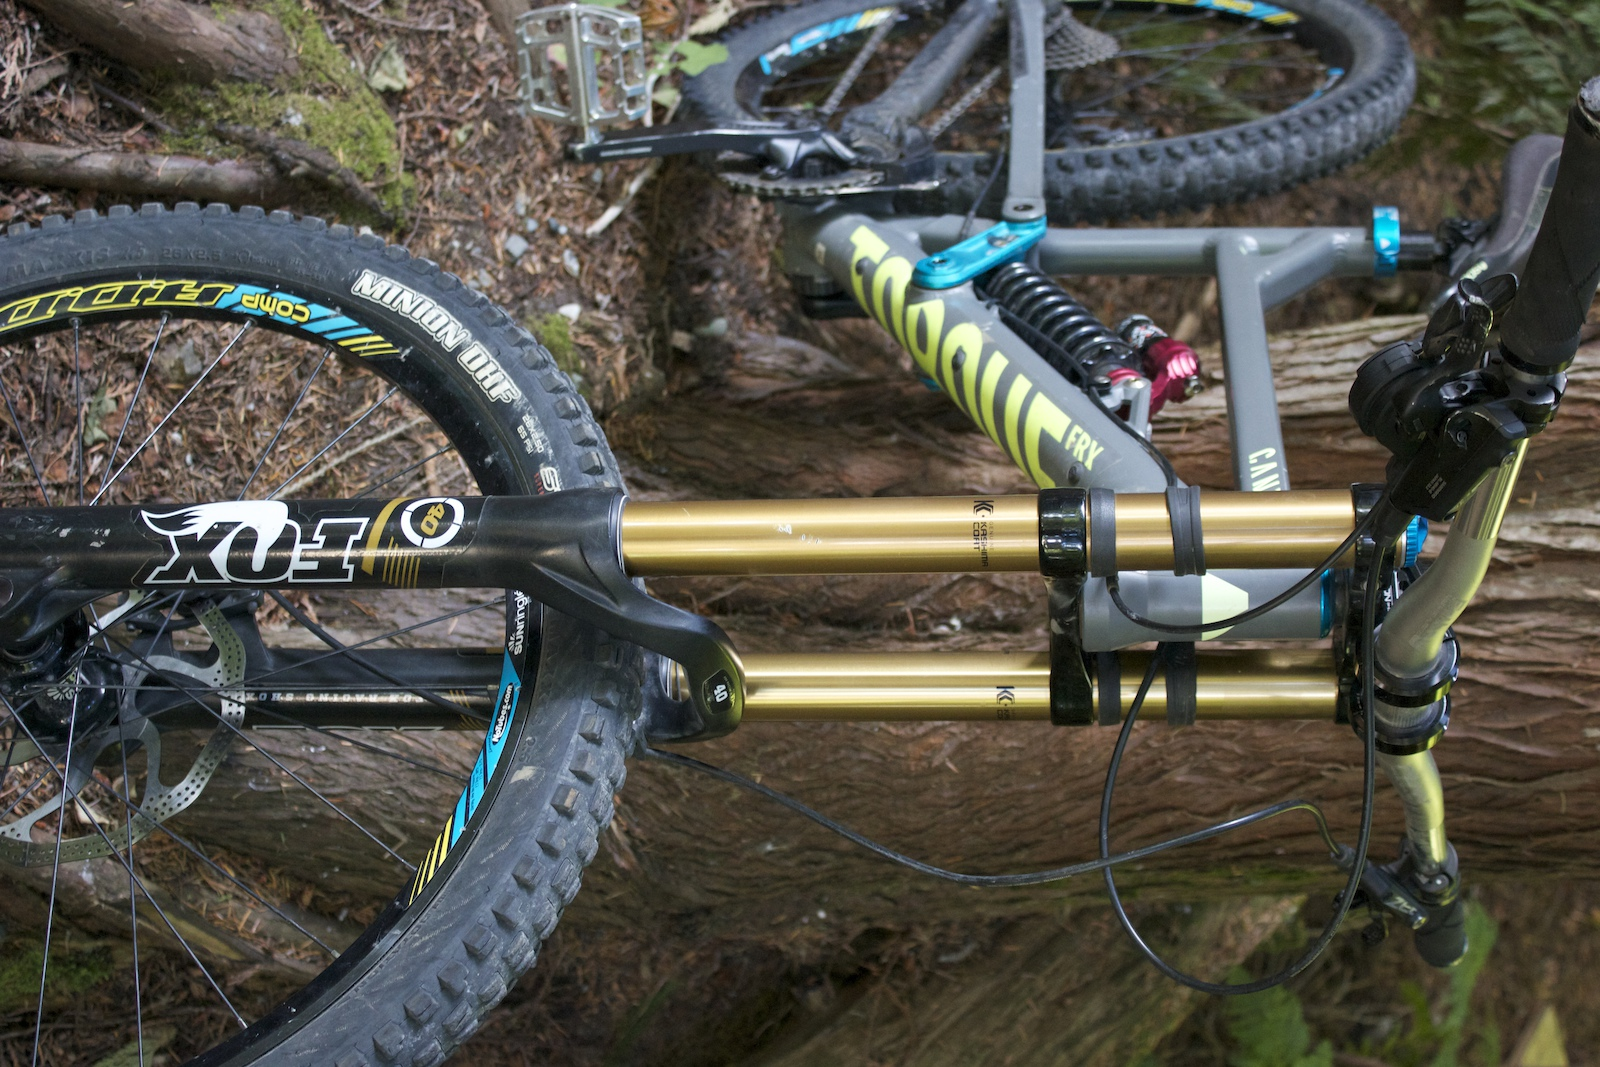 2013 Canyon Torque FRX Playzone M upgraded